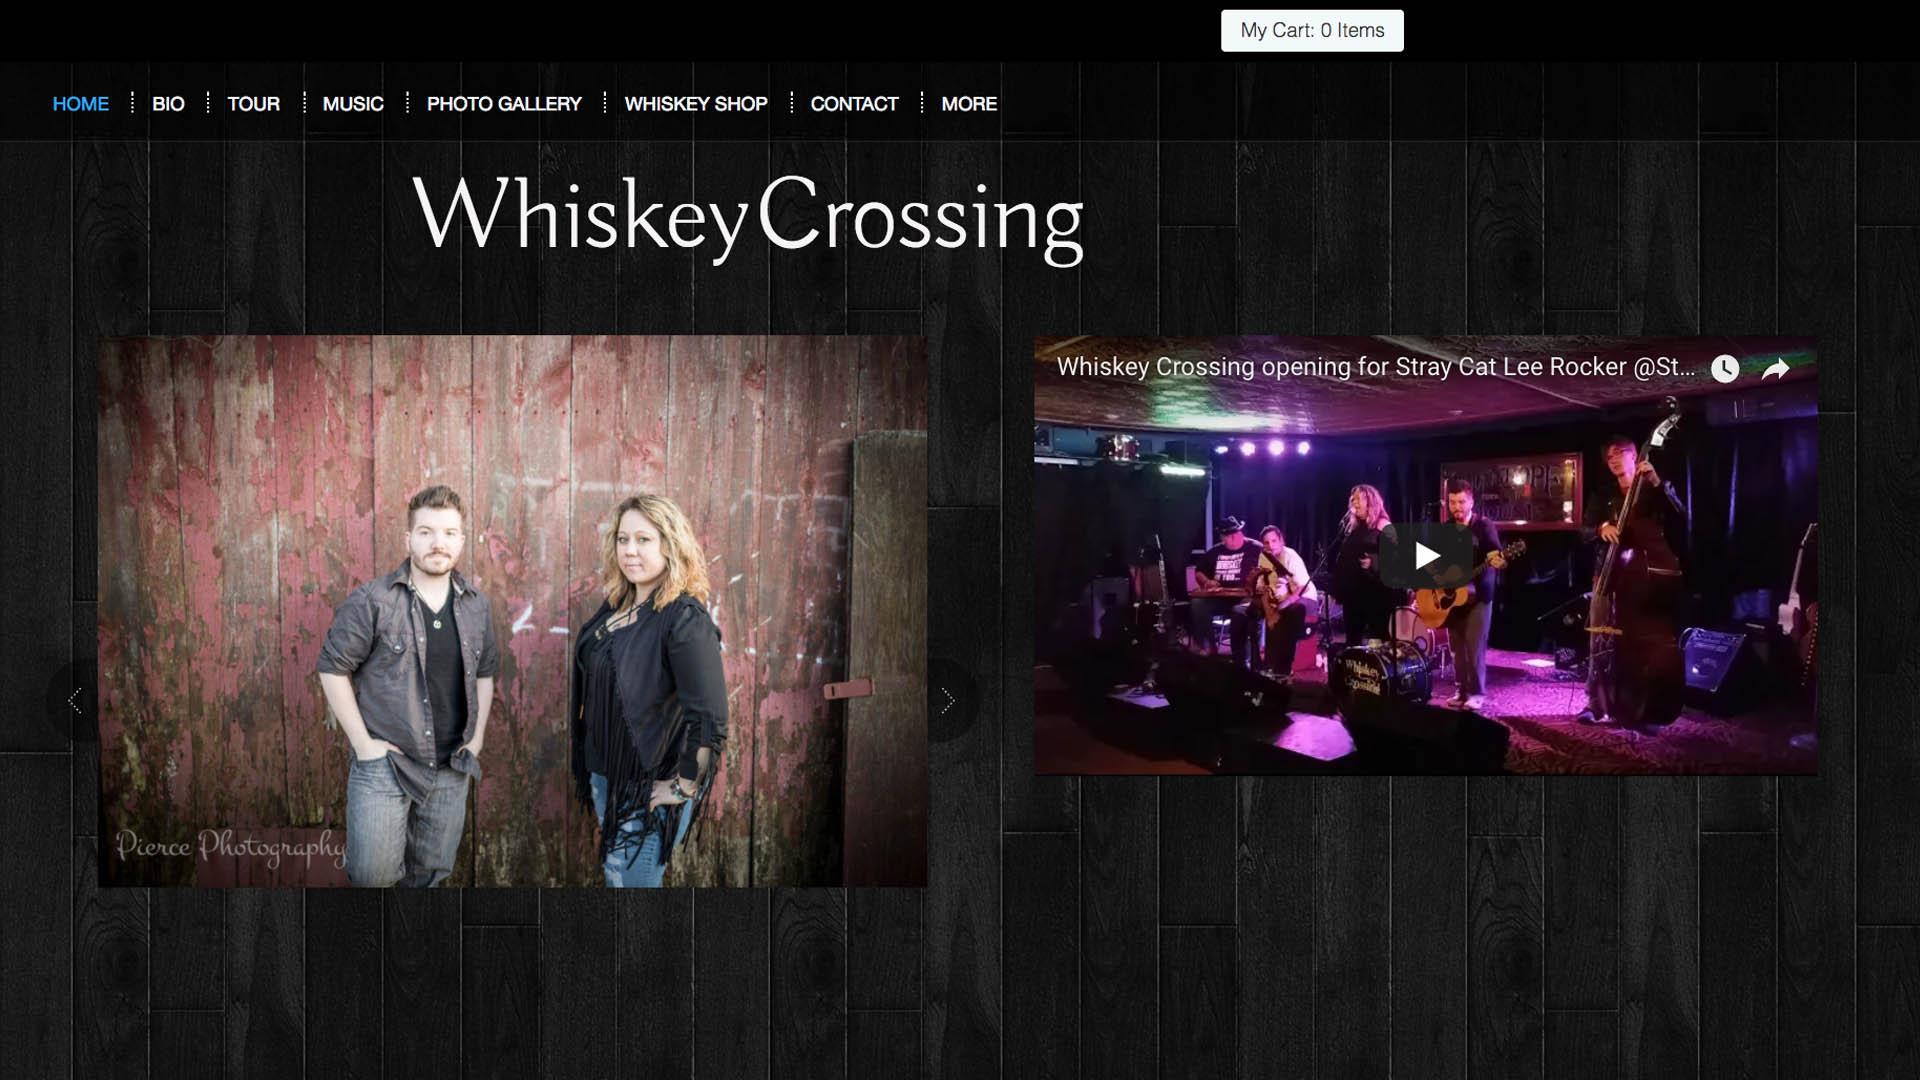 www.whiskeycrossing.com